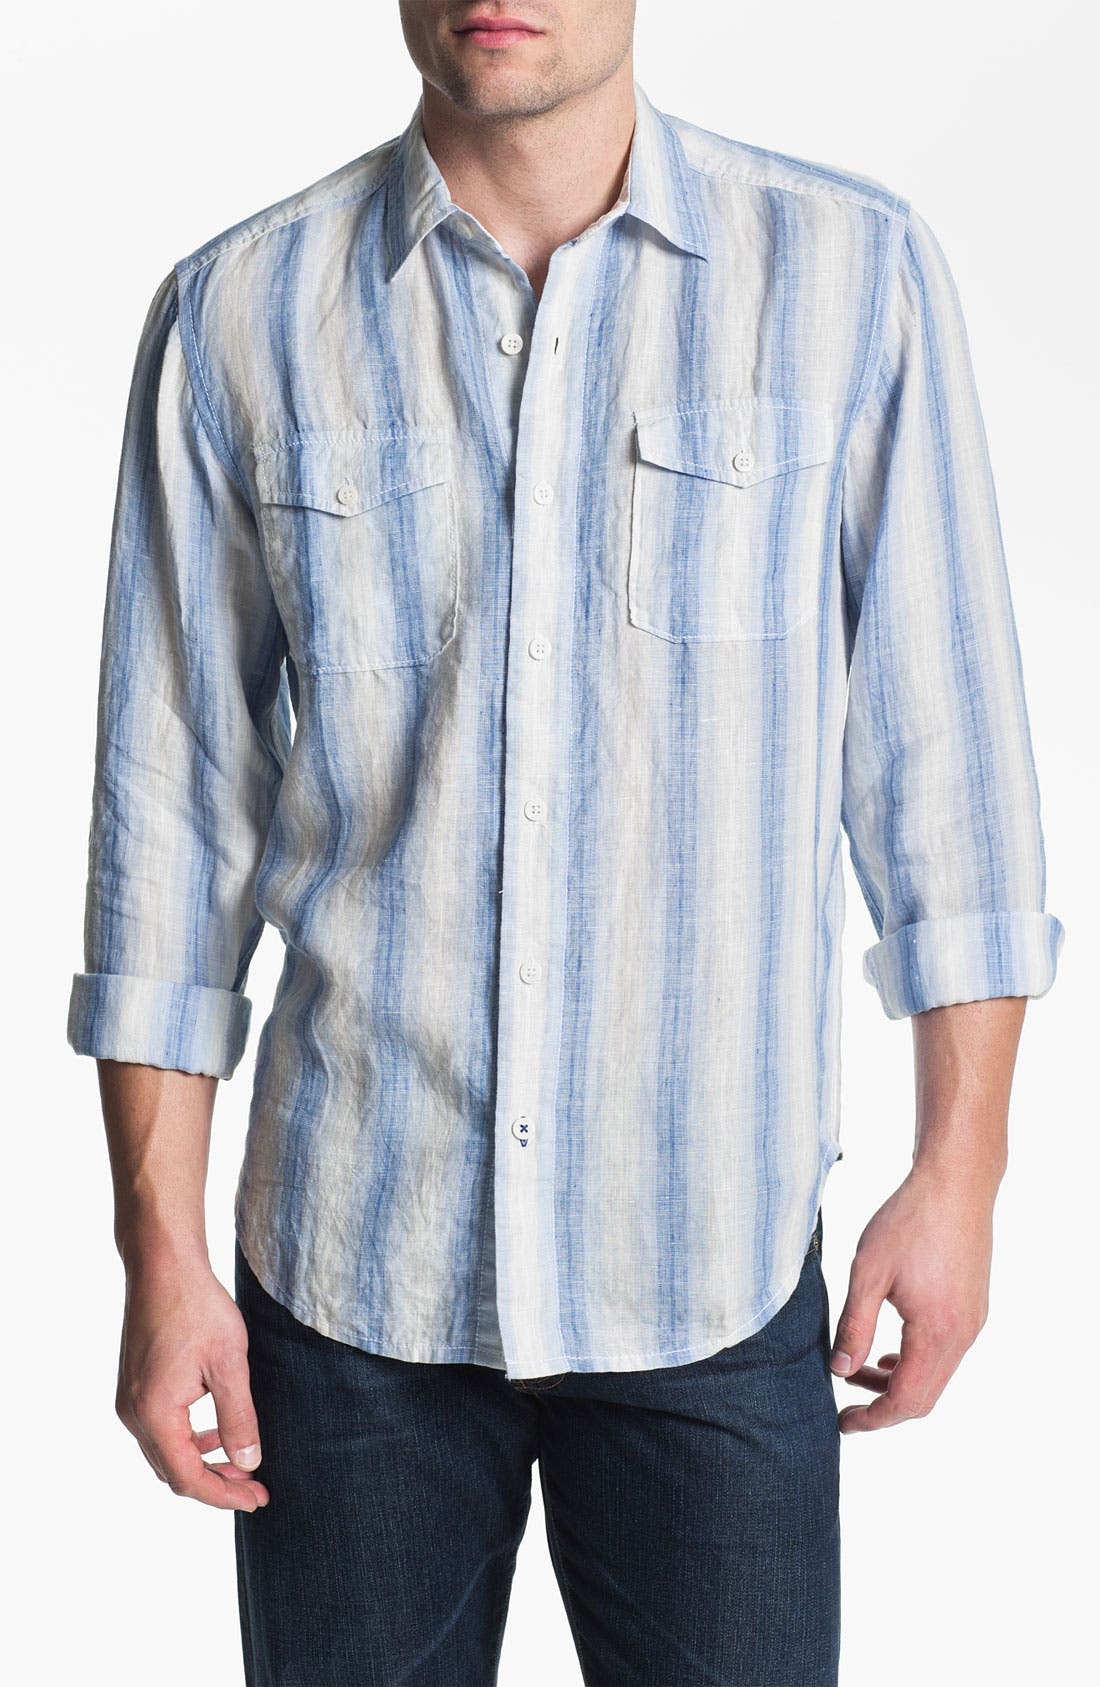 Alternate Image 1 Selected - Tommy Bahama 'Eastern Seaboard' Linen Sport Shirt (Big & Tall)